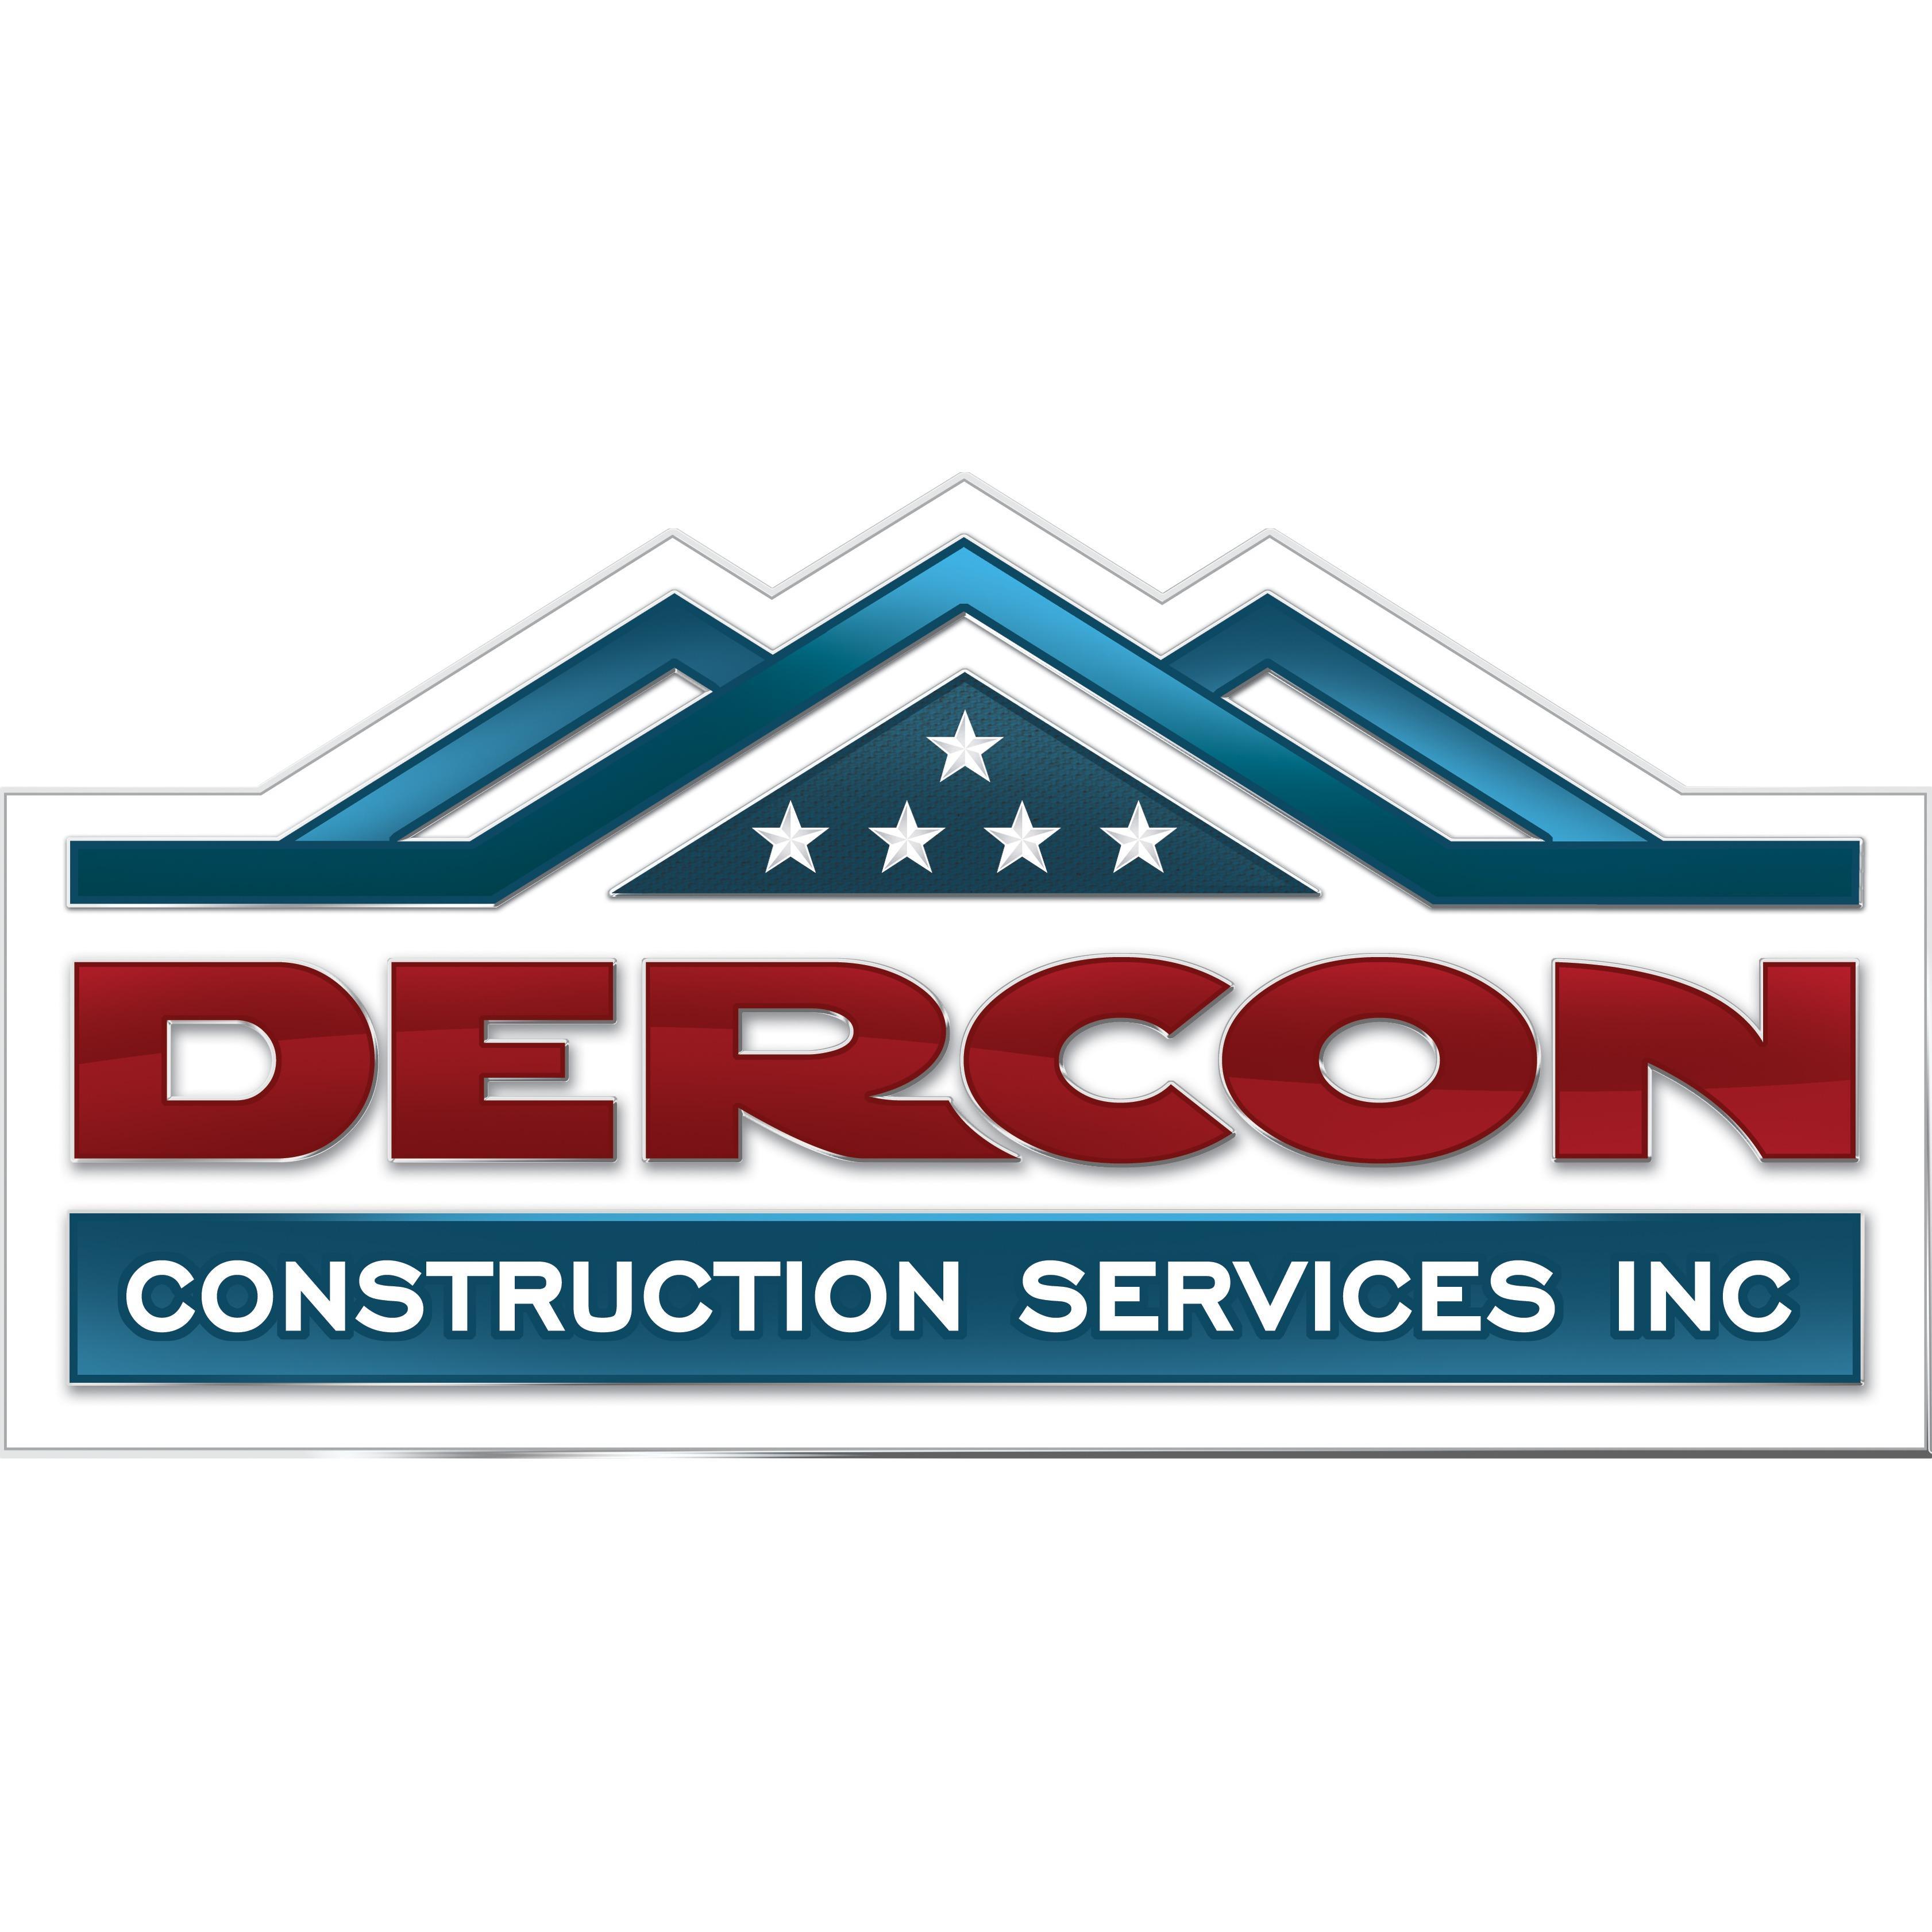 Dercon Construction Services Inc.